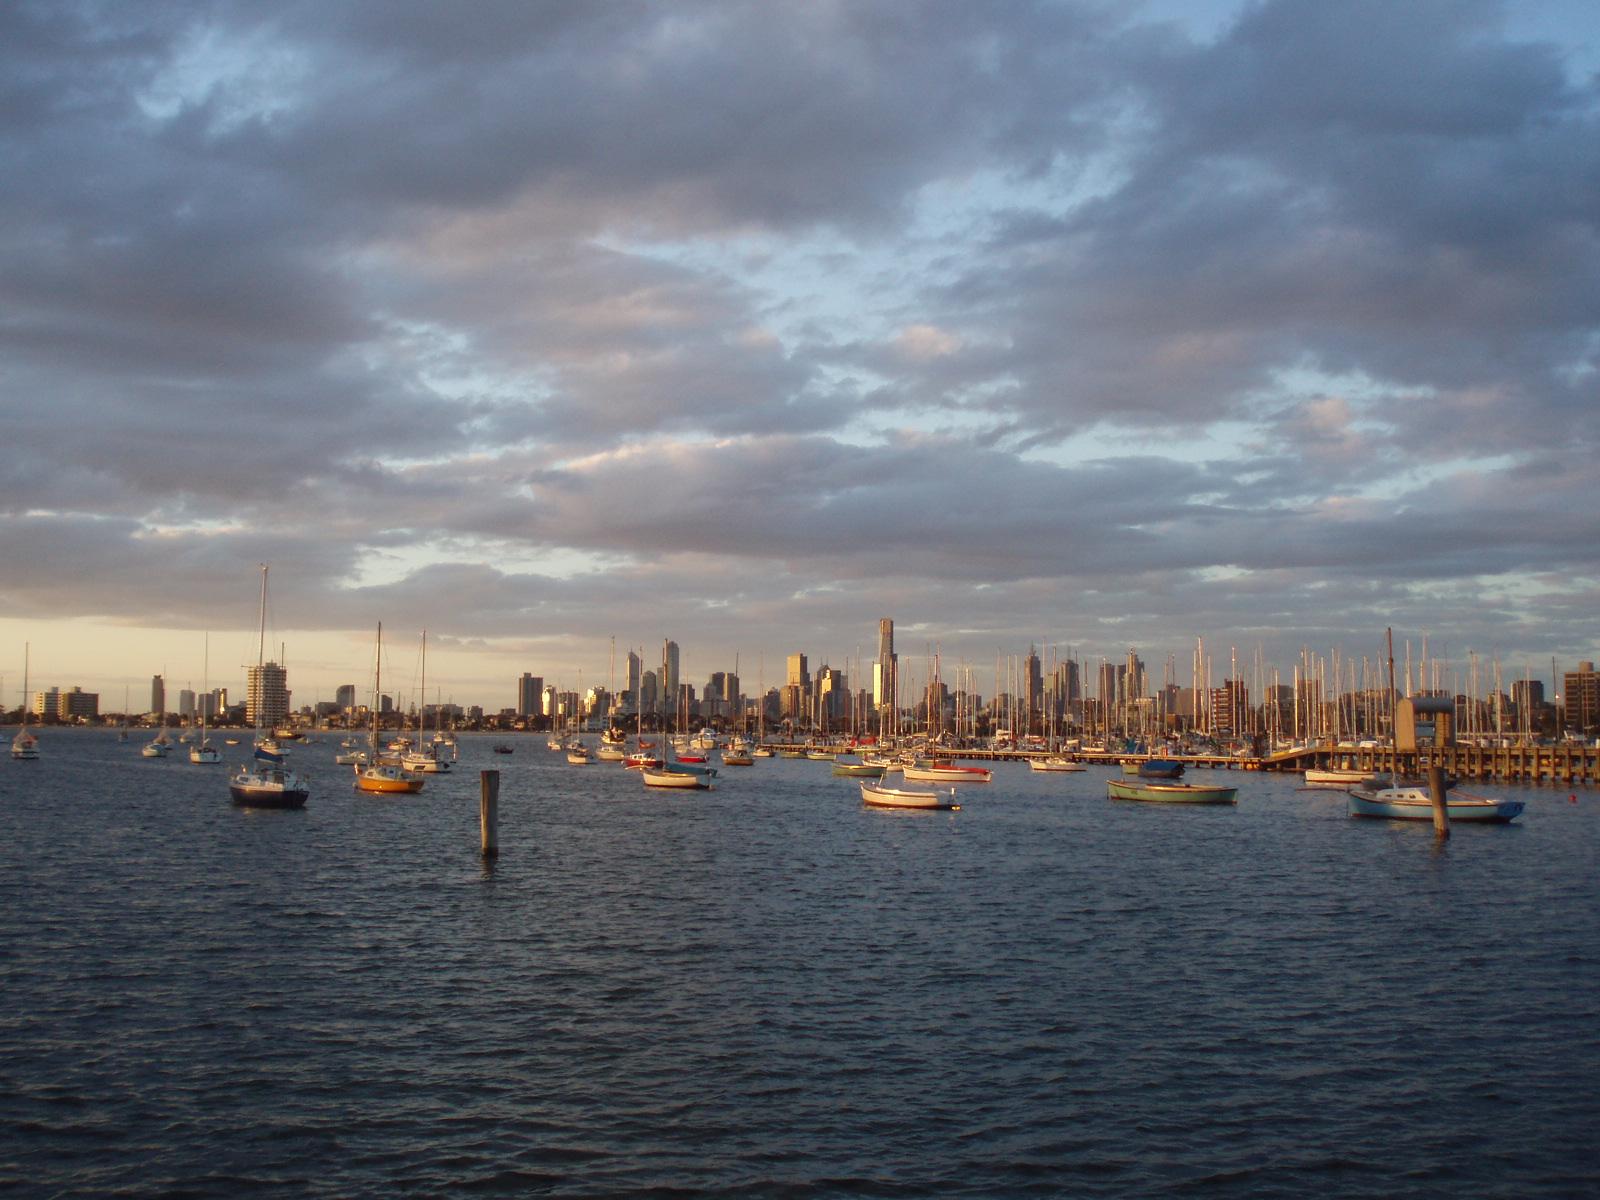 Top 3 dating sites in australia in Melbourne